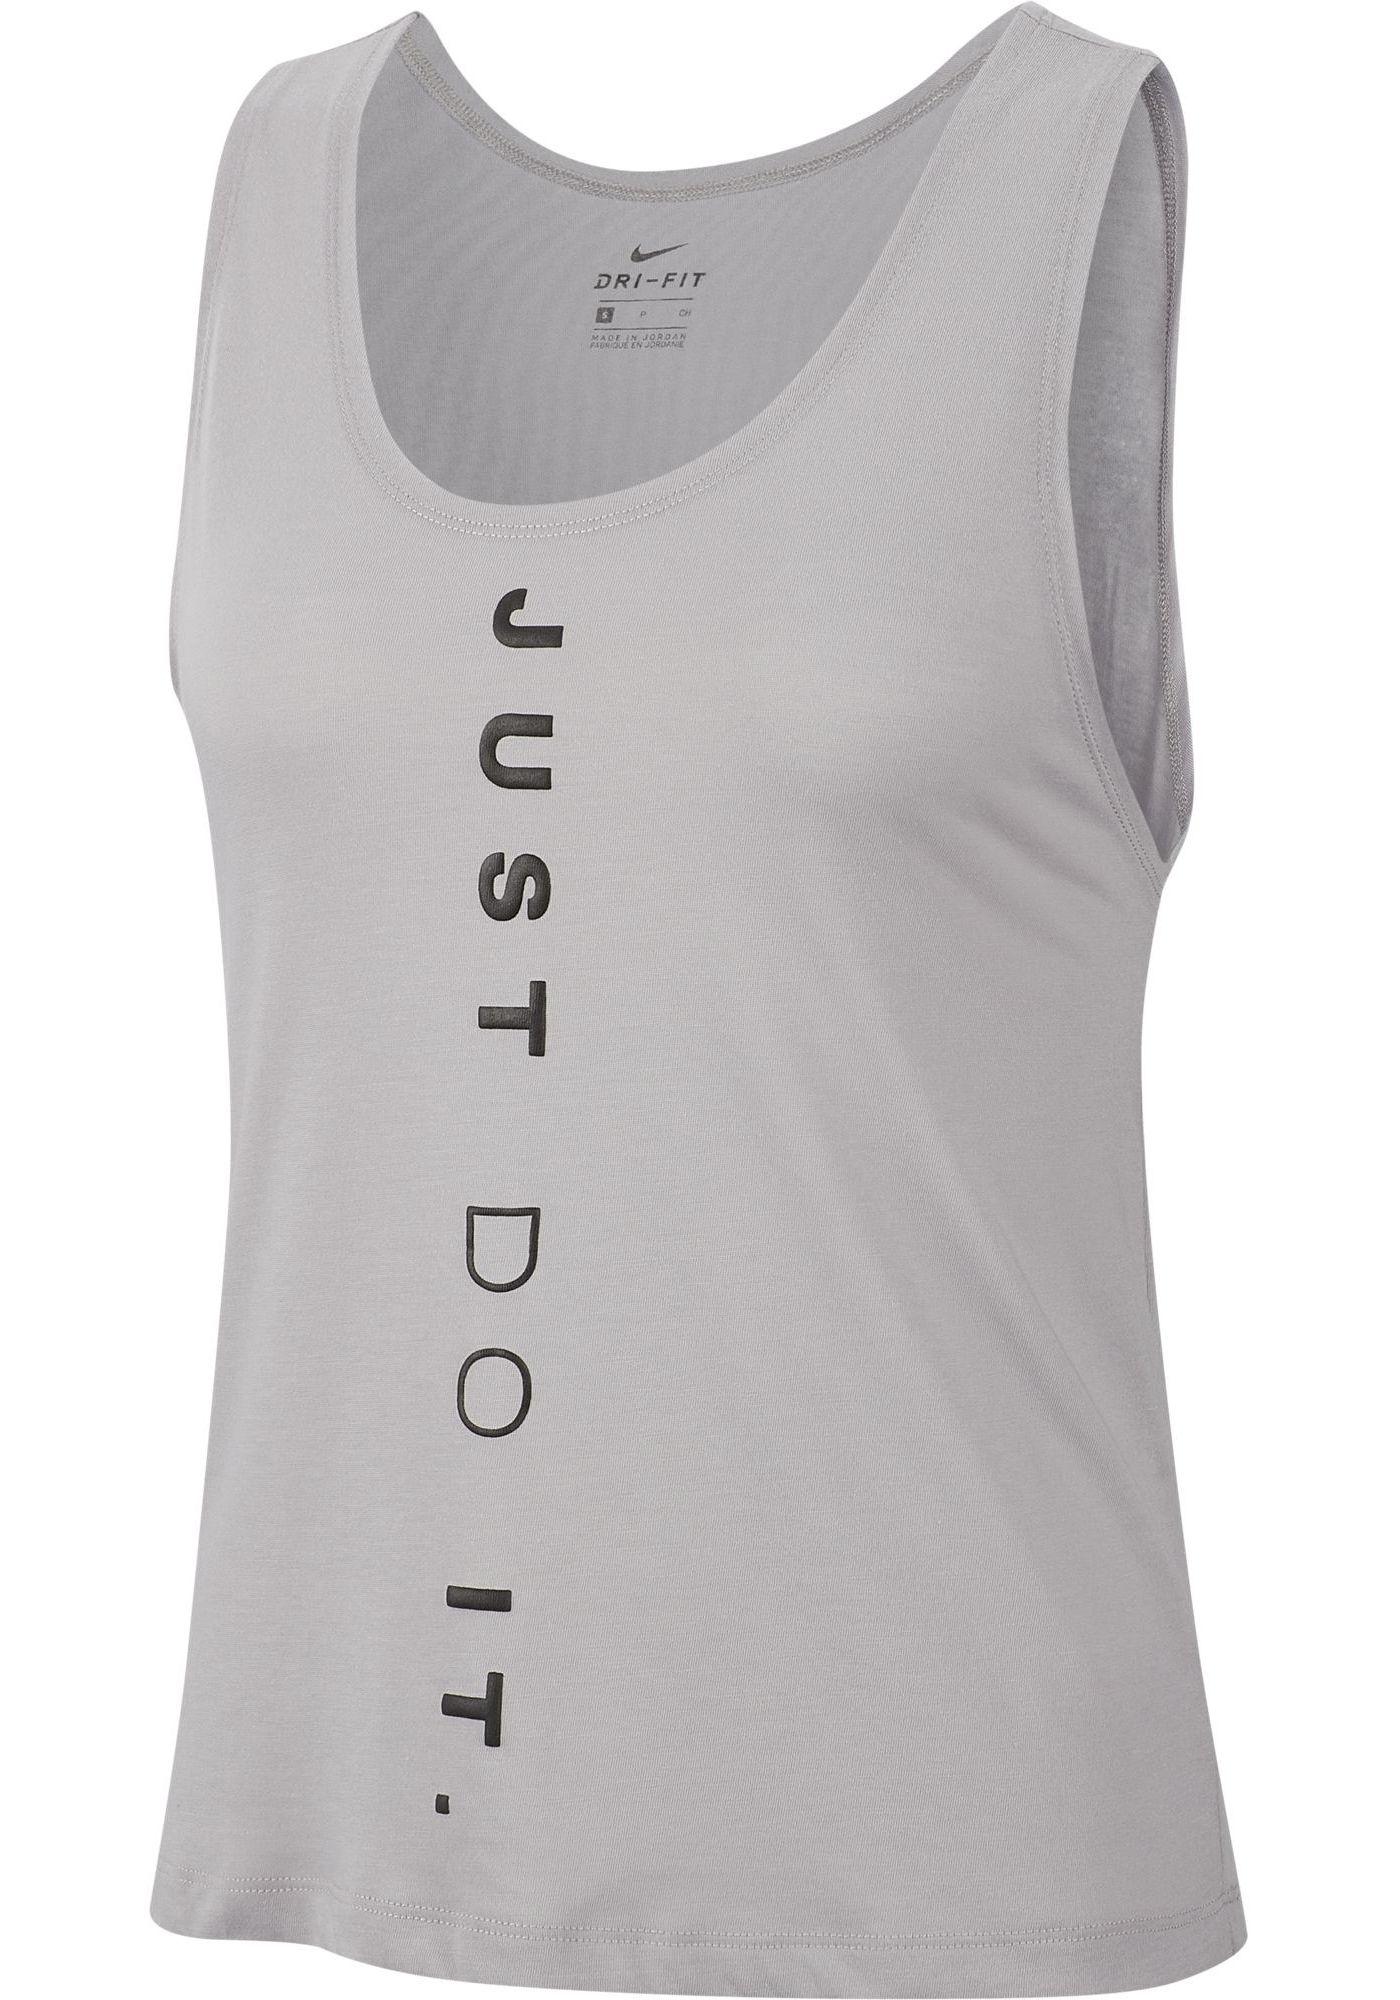 Nike Women's Dri-Fit Miler Running Tank Top